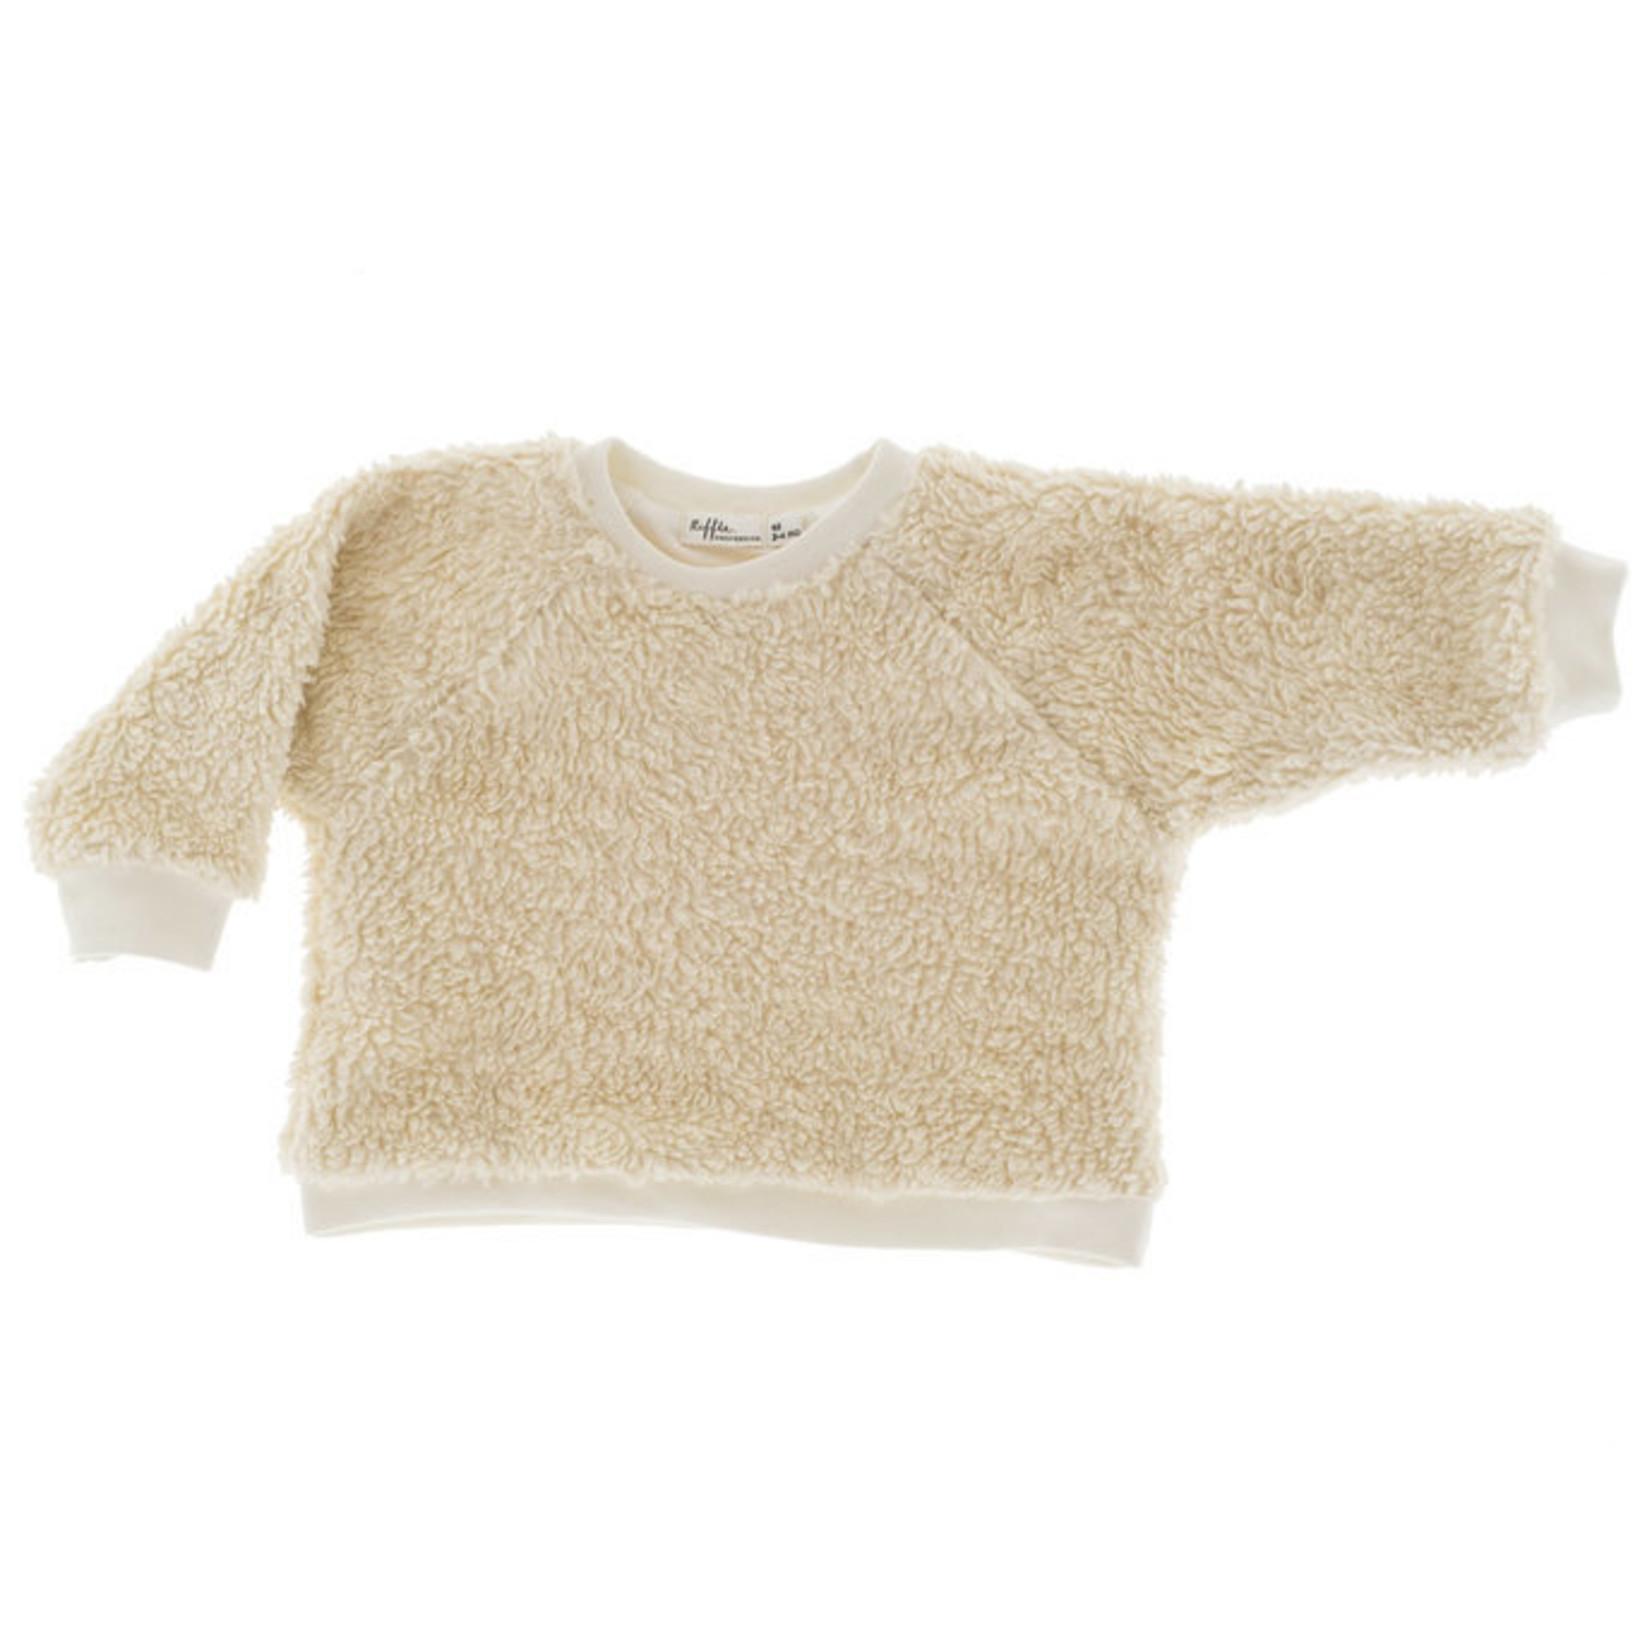 Riffle . Amsterdam Unisex sweater teddy off white